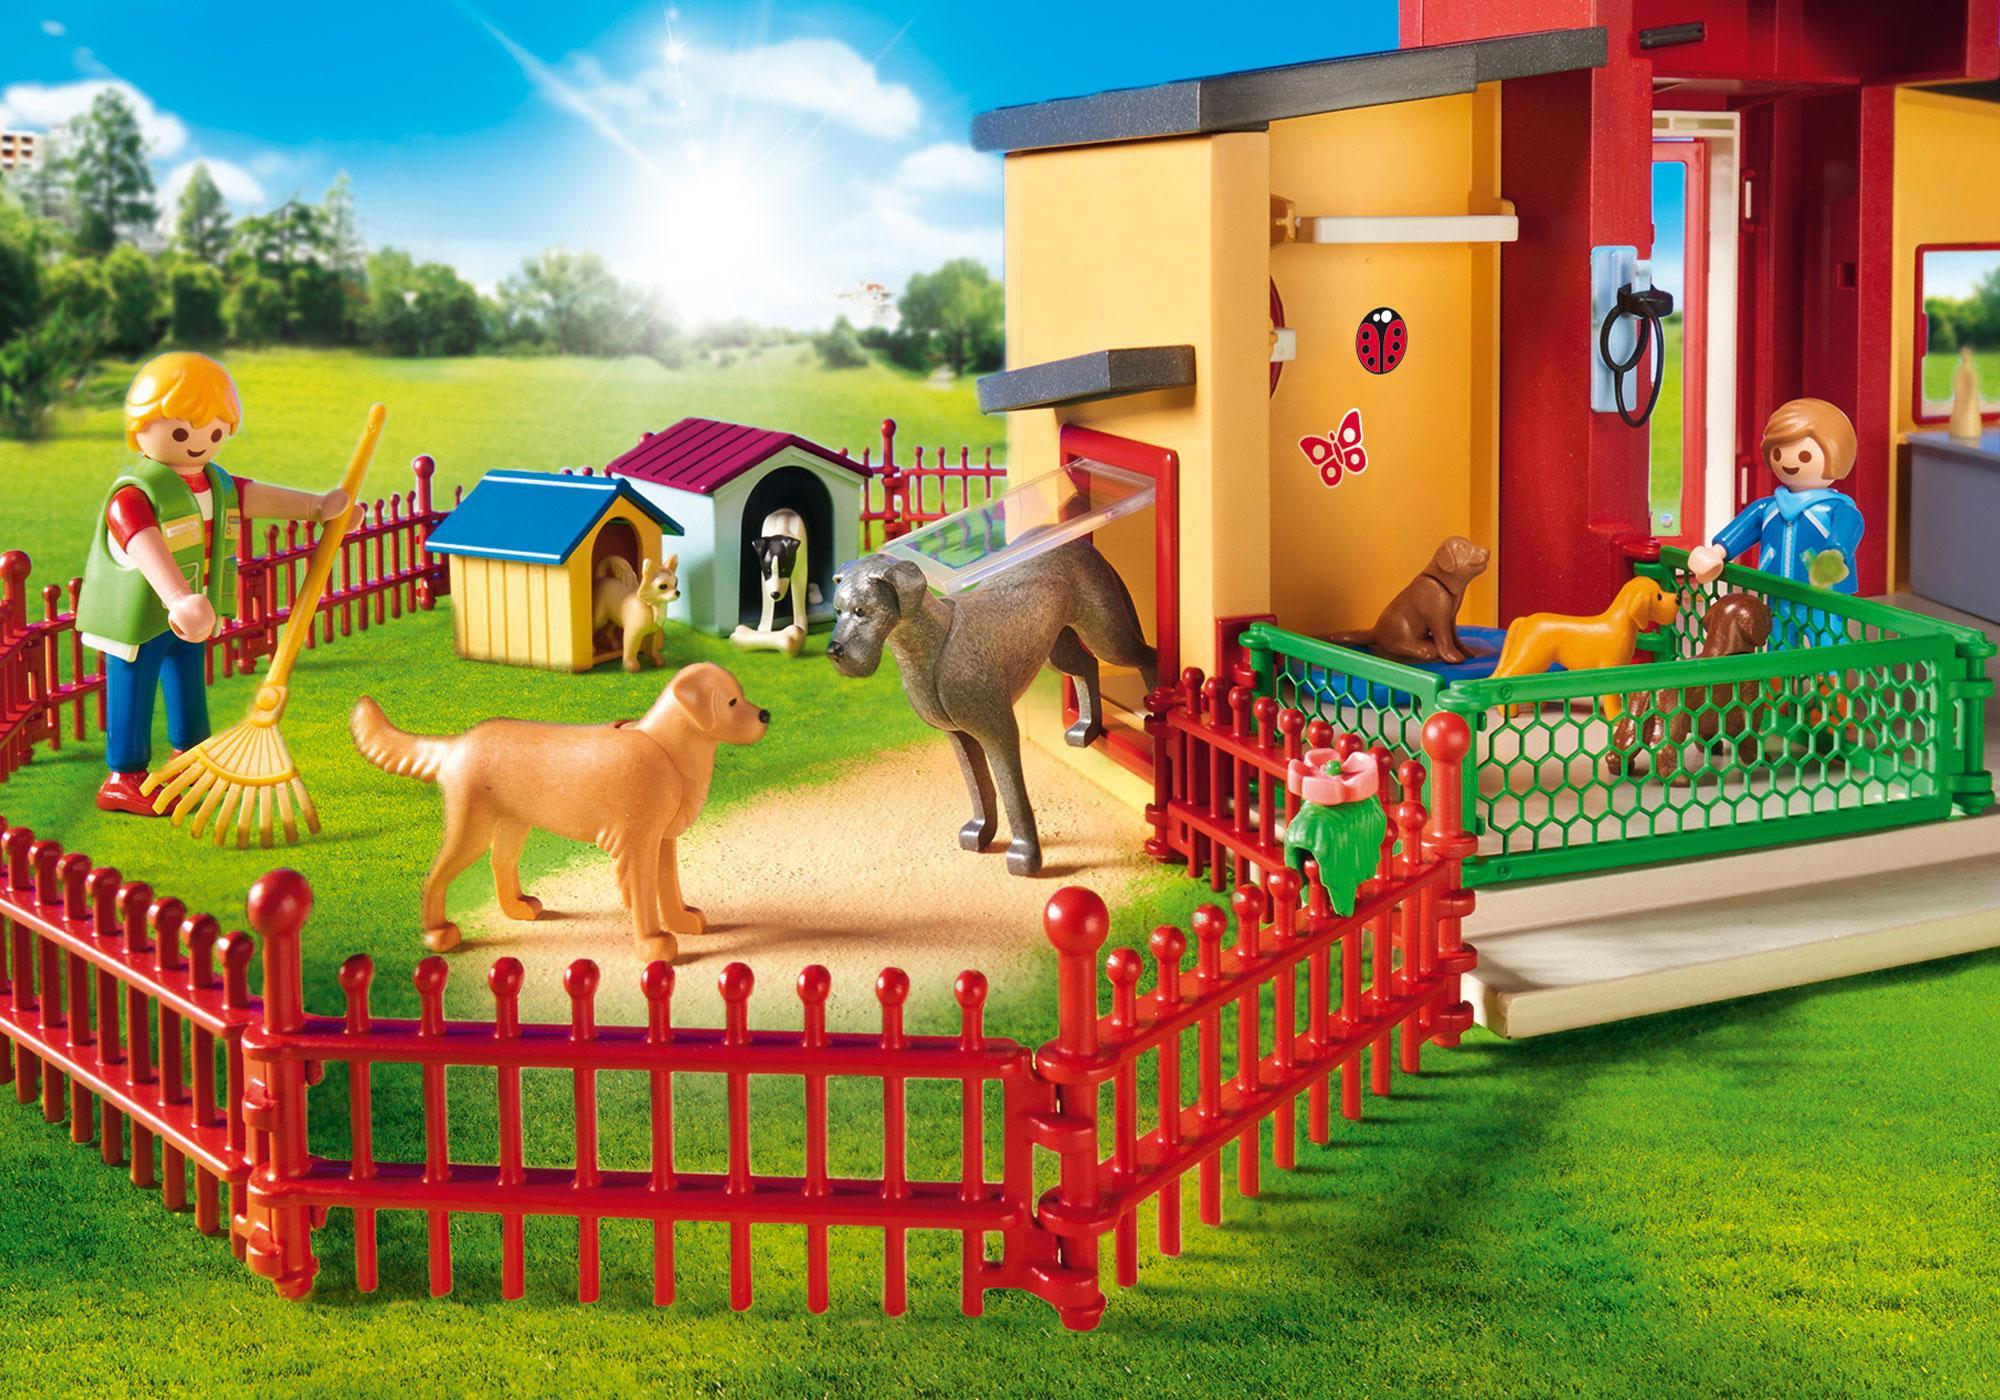 http://media.playmobil.com/i/playmobil/9275_product_extra1/Tiny Paws Pet Hotel